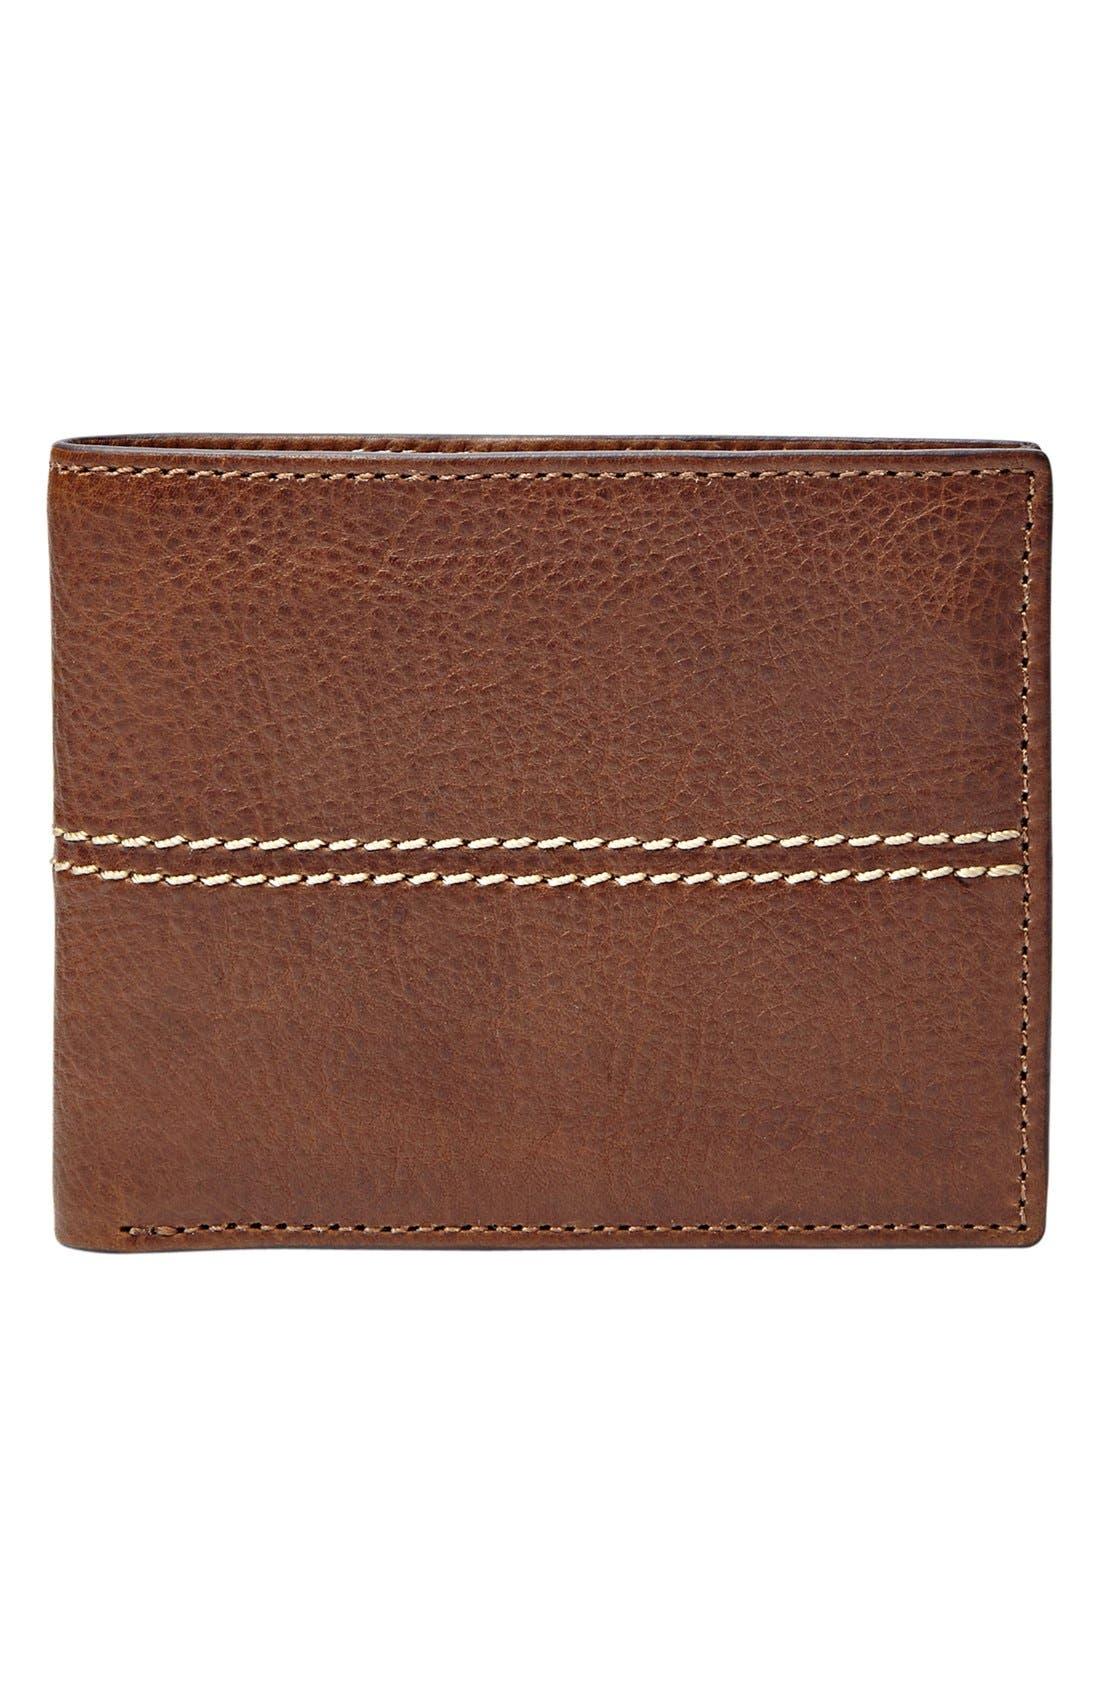 FOSSIL Turk Leather RFID Wallet